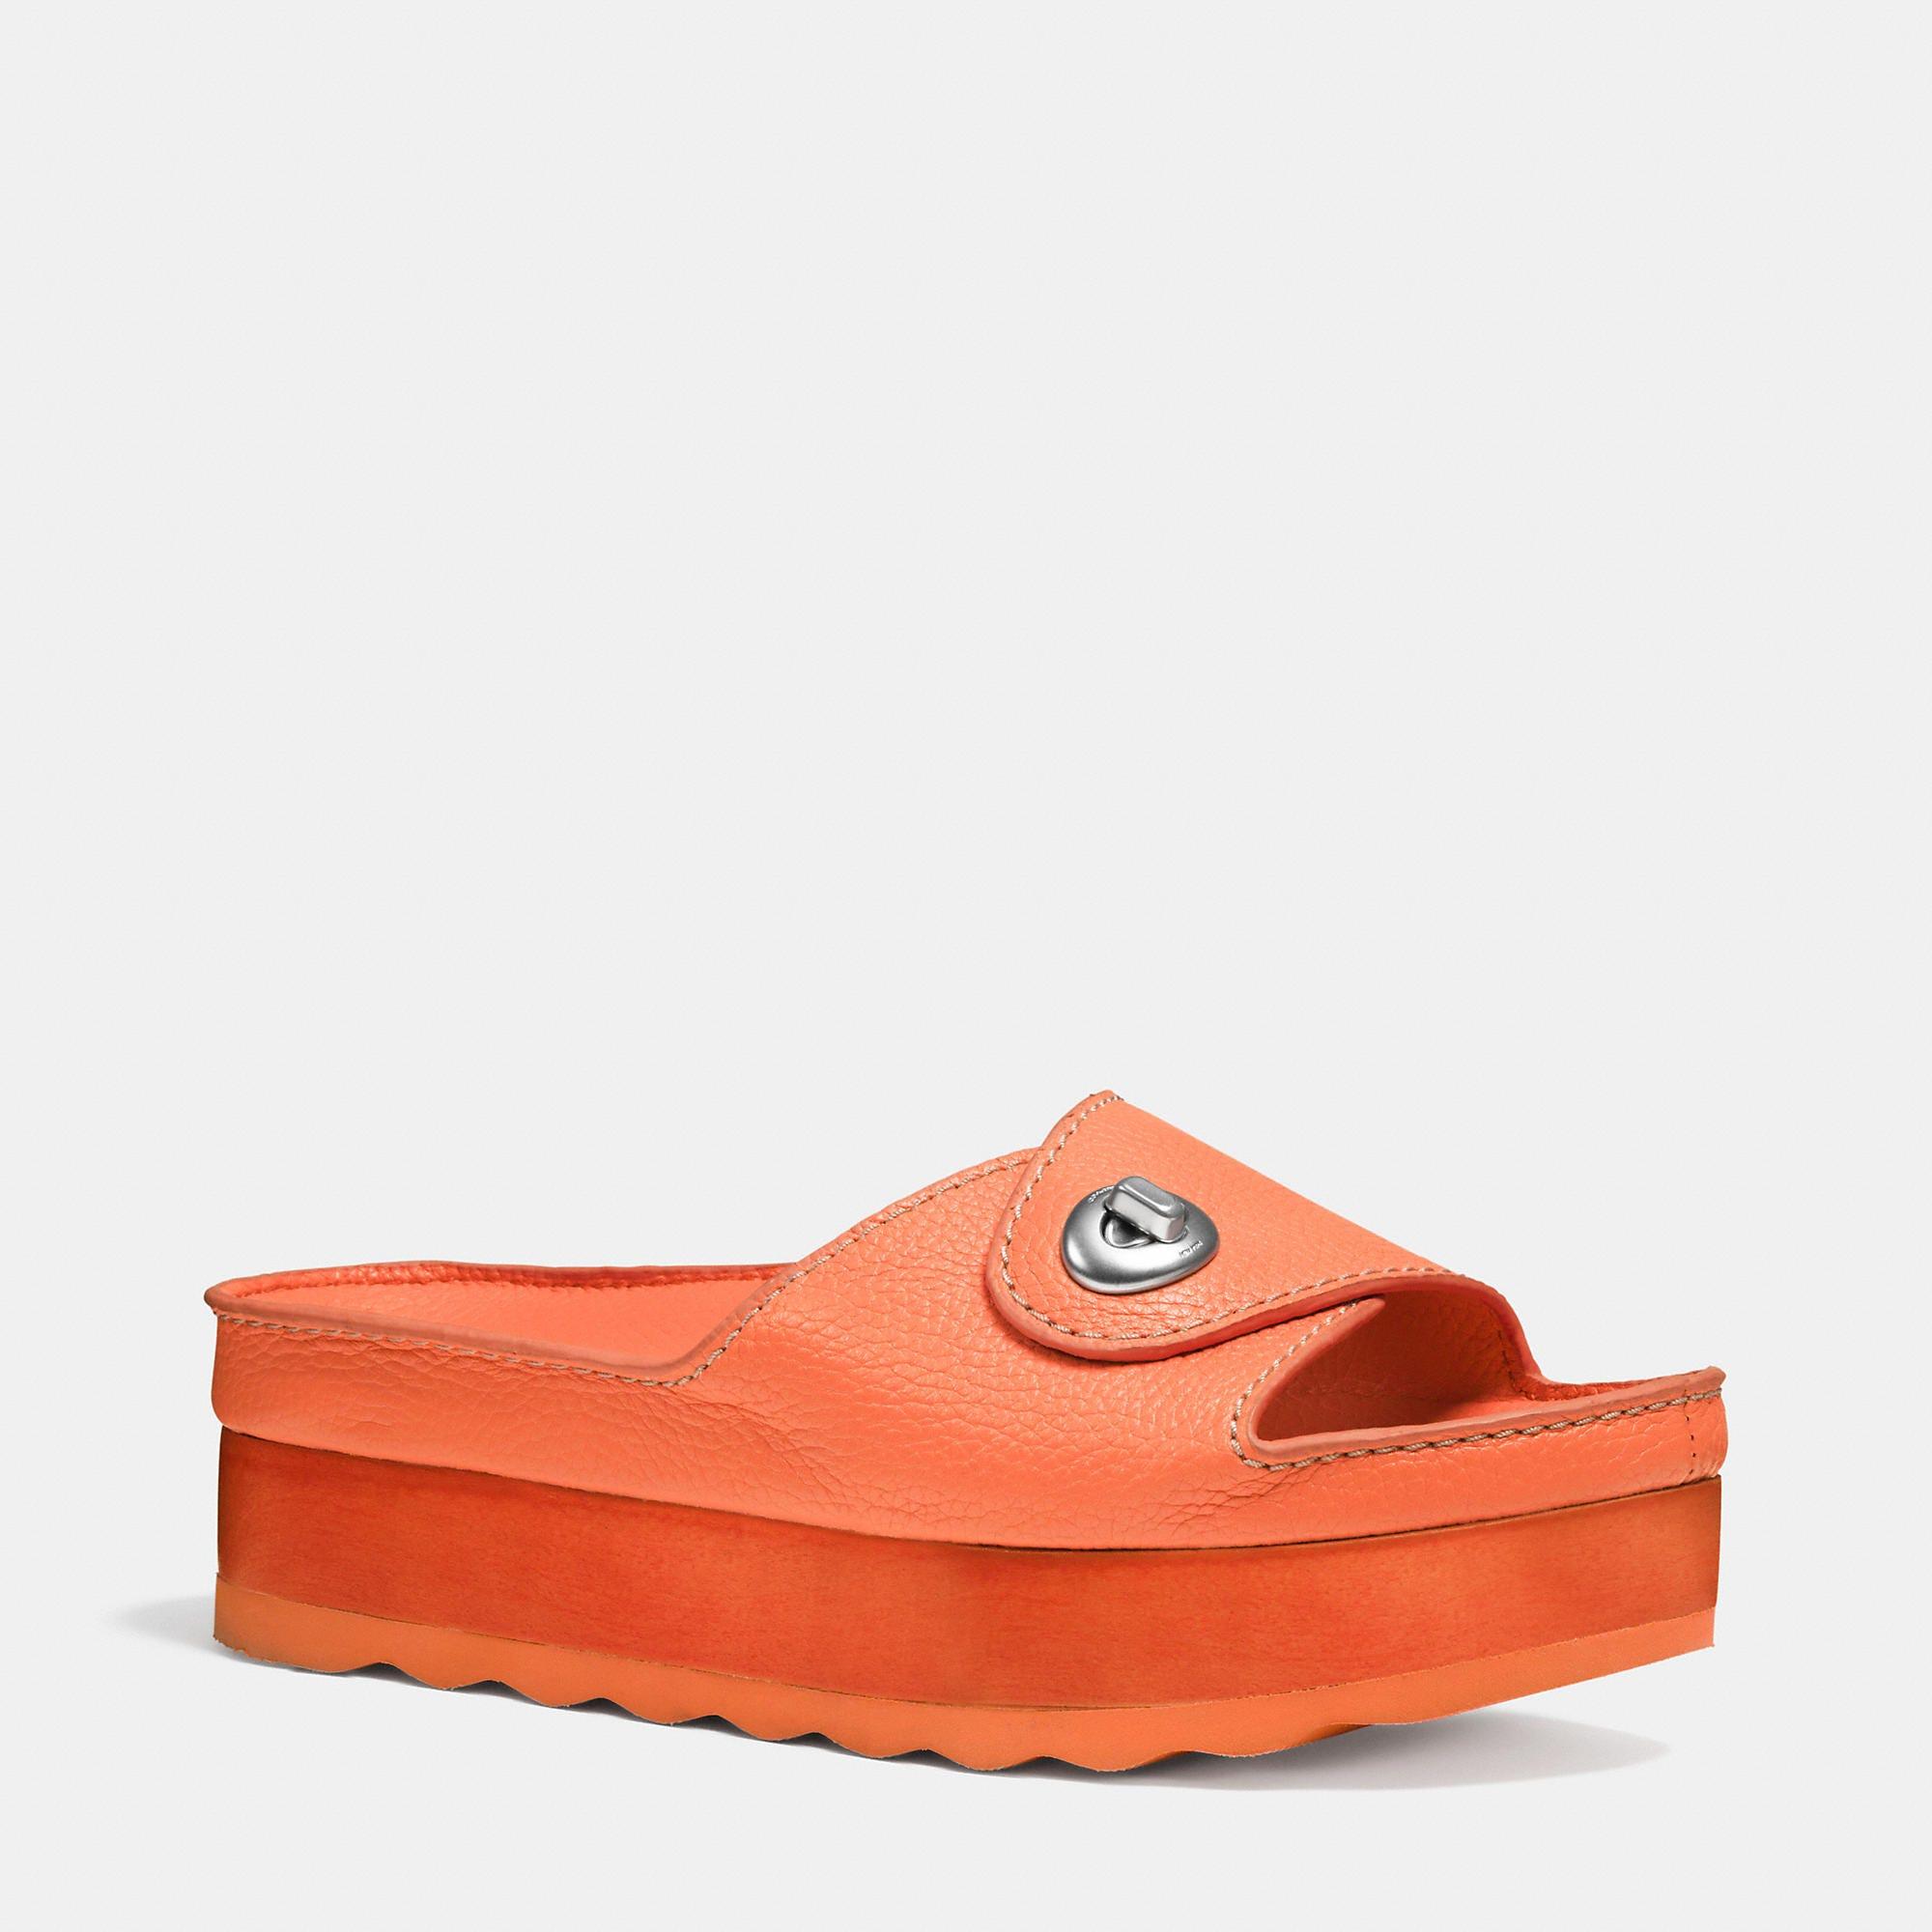 Coach Buys Shoe Company